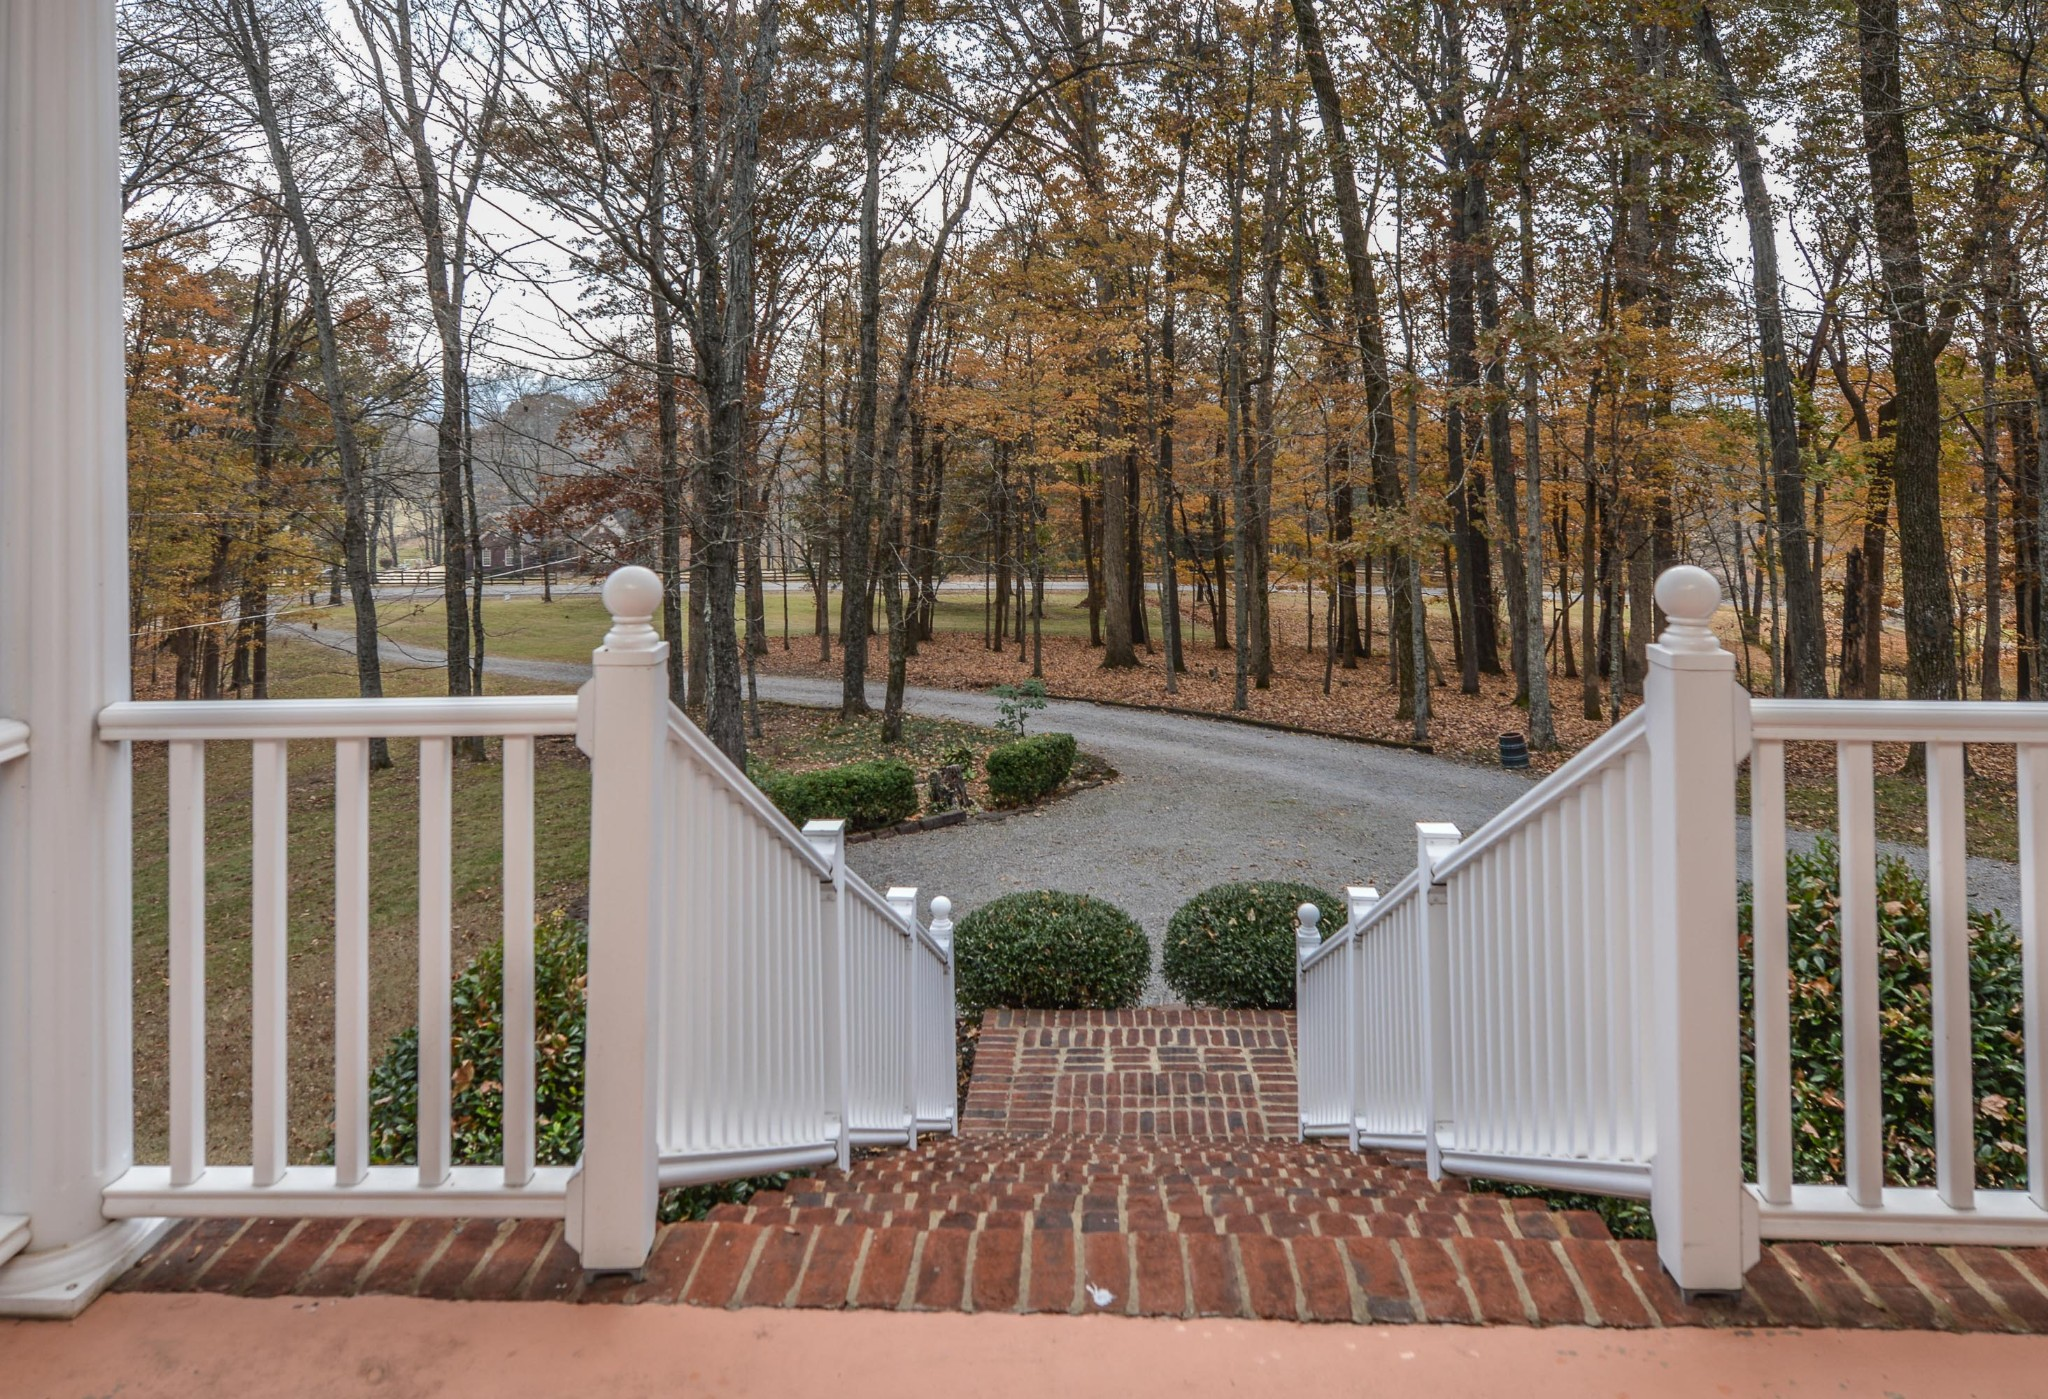 410 Cummings Ln, Gallatin, TN 37066 - Gallatin, TN real estate listing